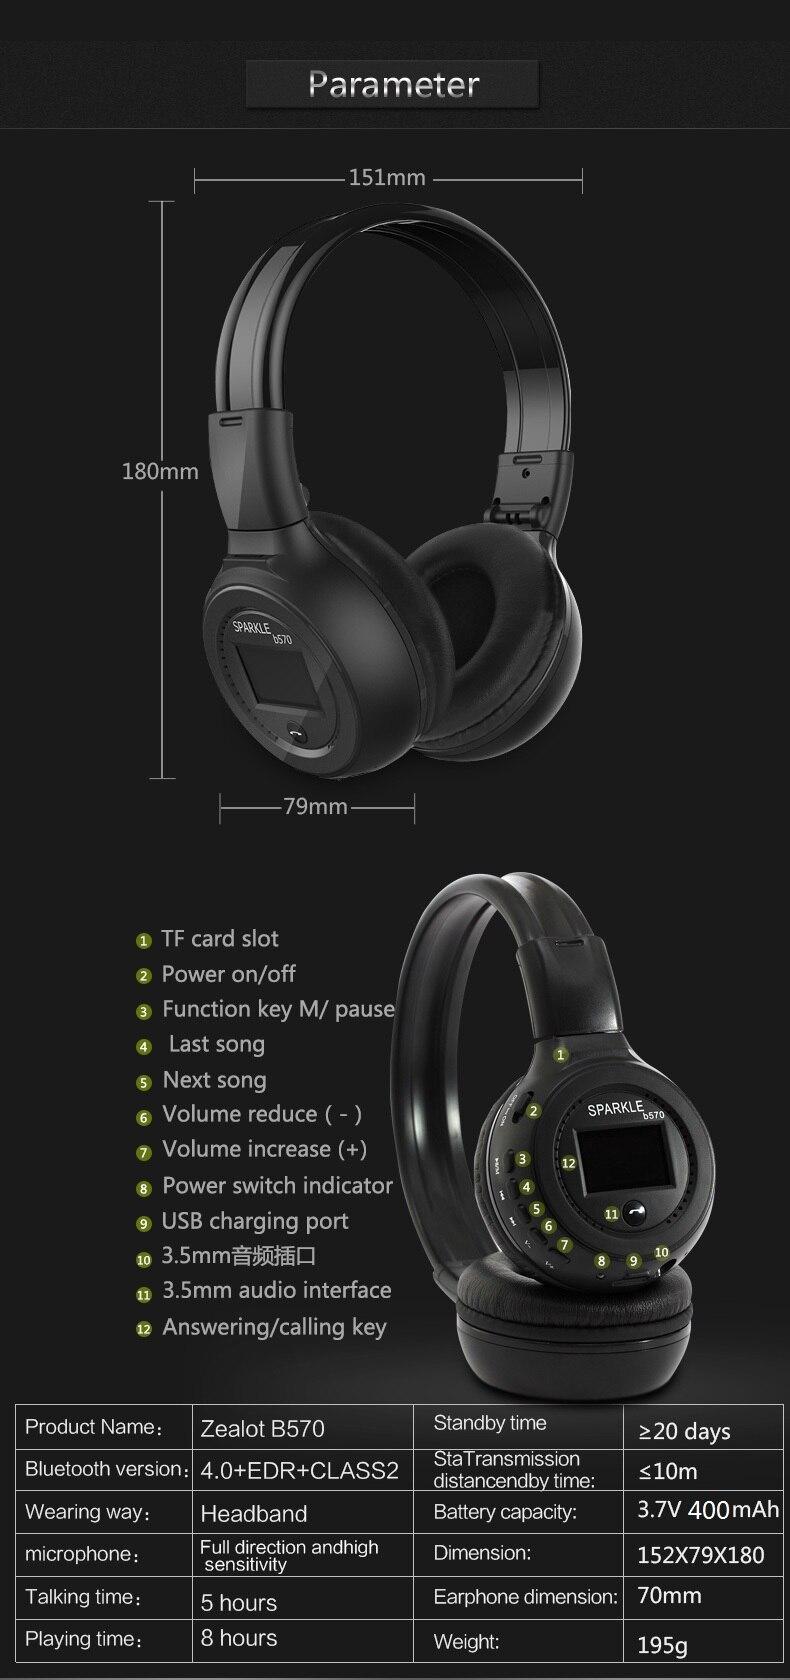 Zealot B570 Earphone Headphone with LCD Screen Bluetooth Headphone Foldable Hifi Stereo Wireless Headset FM Radio TF SD Slot 20